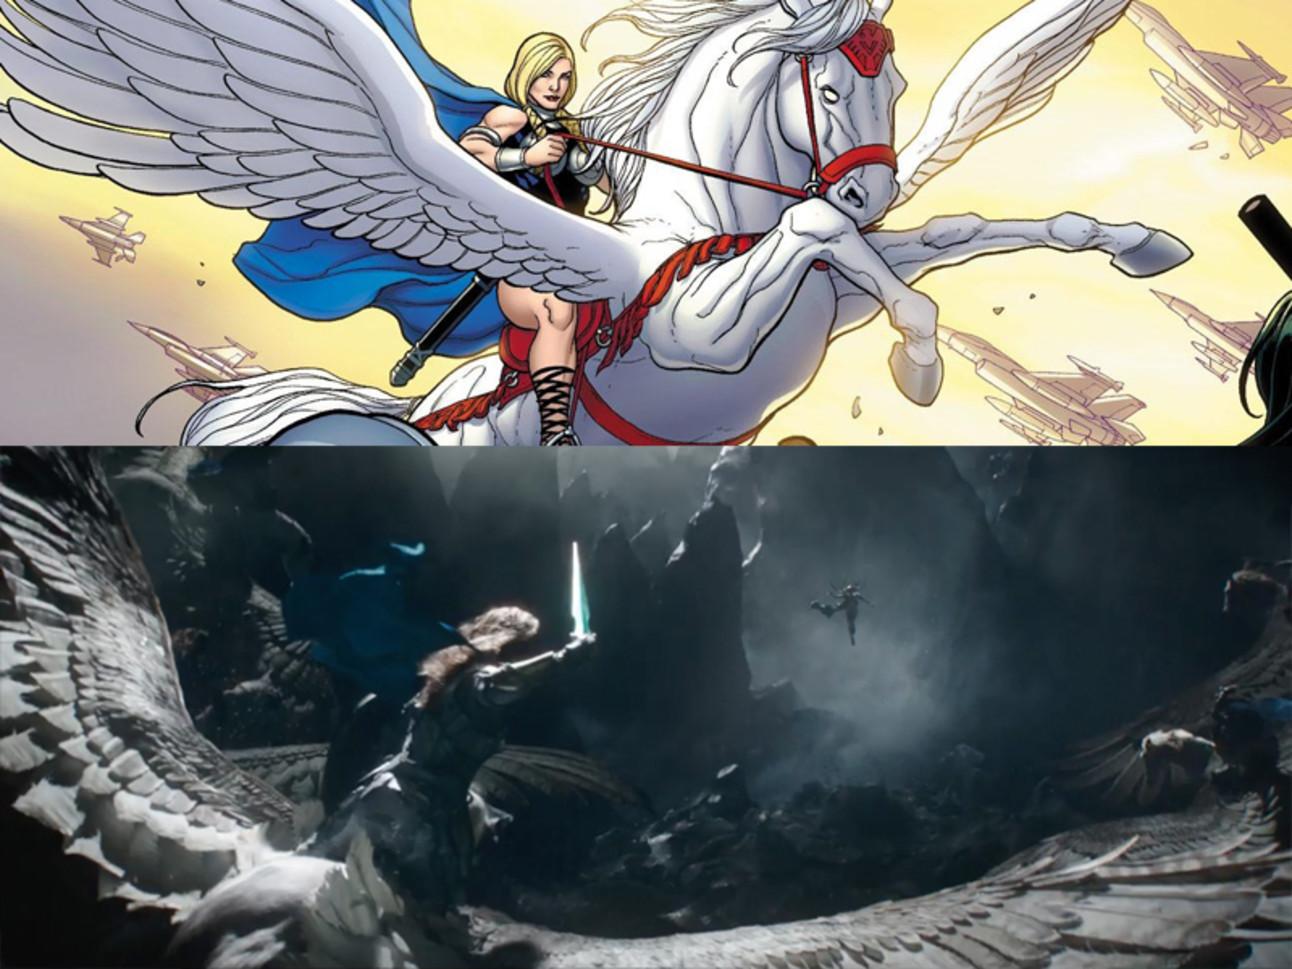 4-valkyrie-pegasus-comics-thor-ragnaraok.jpg